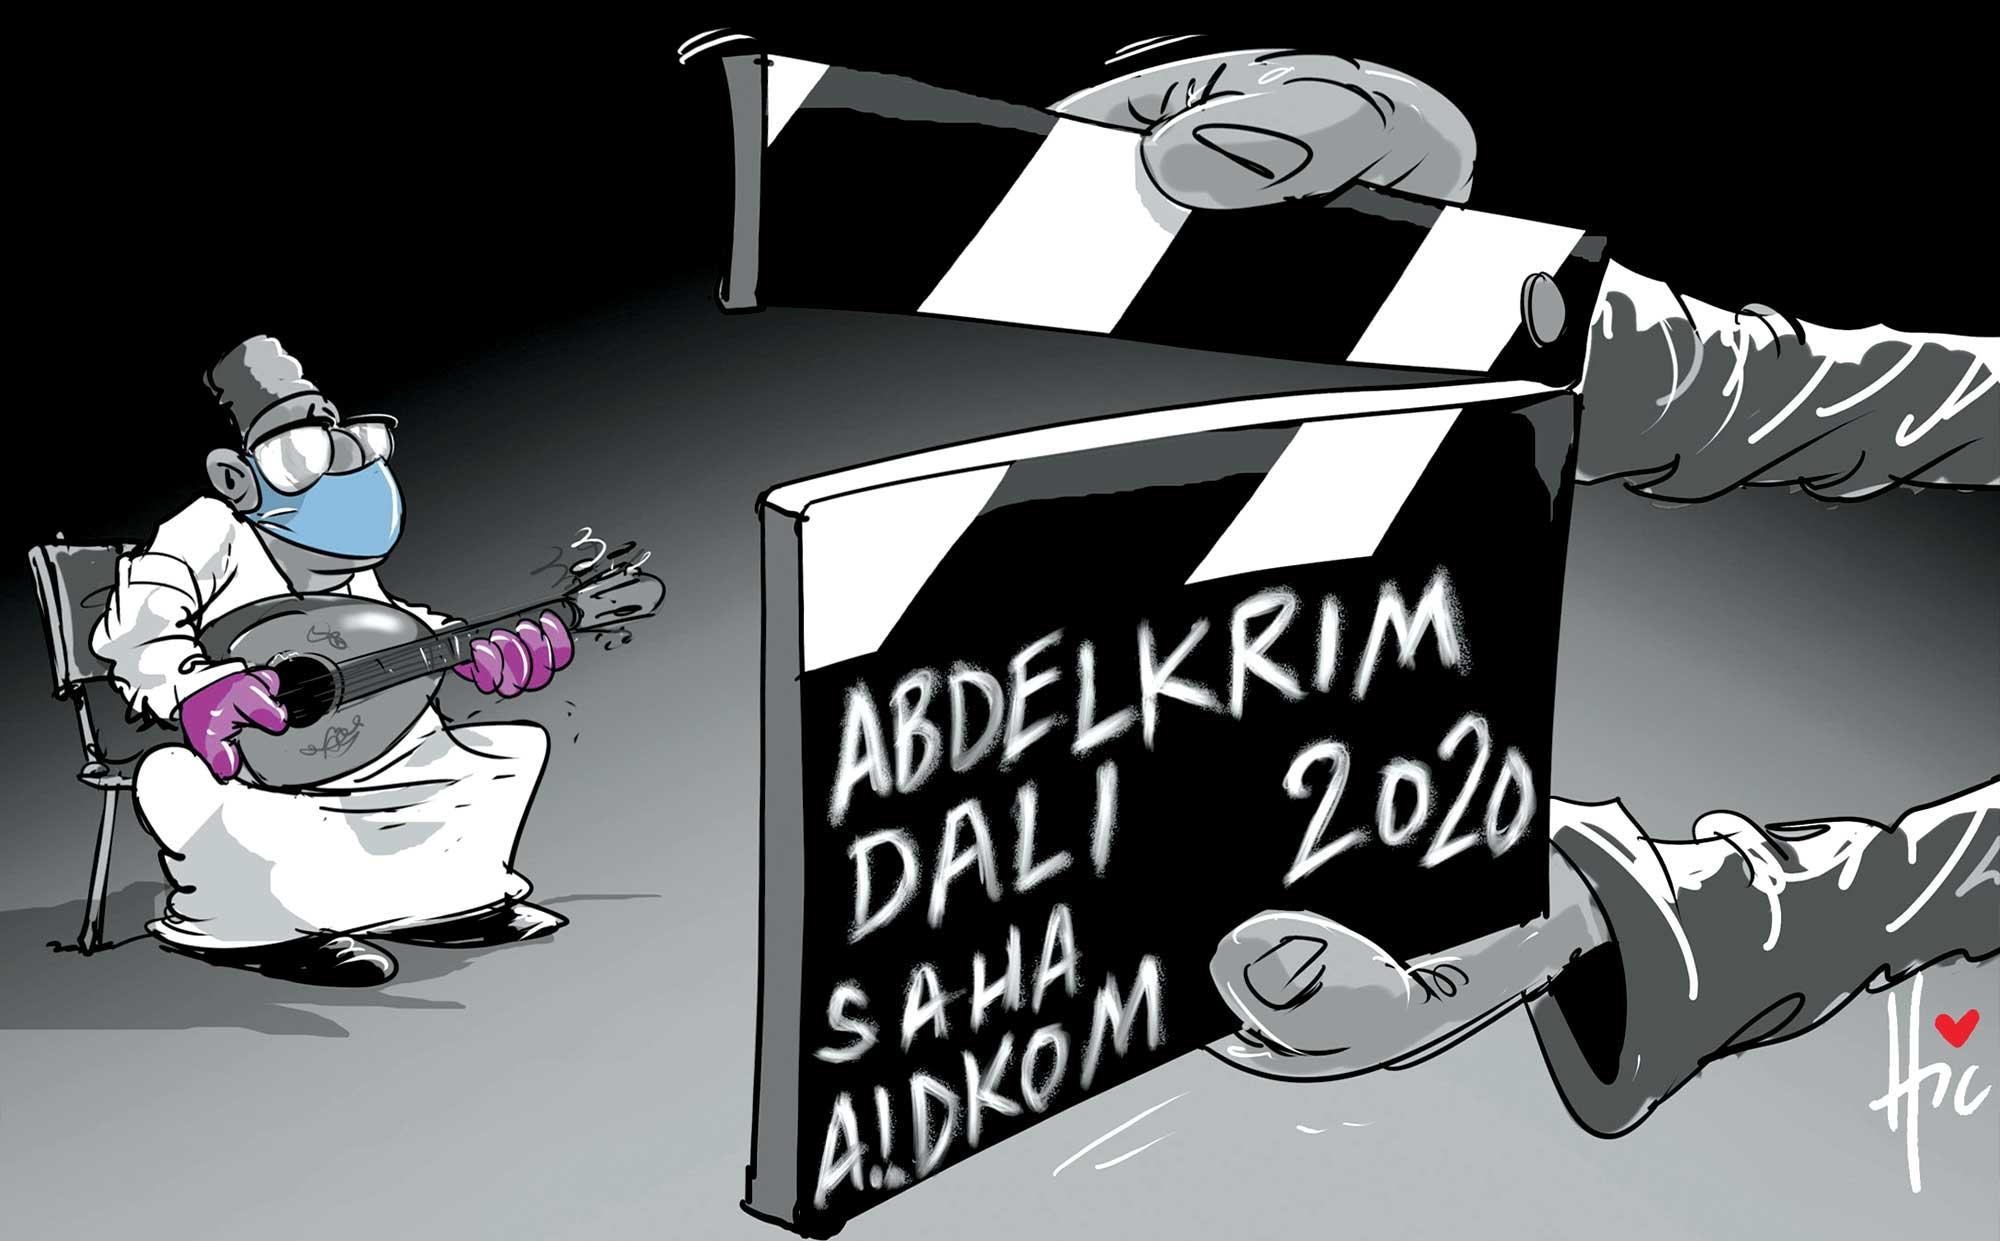 Abdelkrim Dali en 2020 : Saha Aidkoum - Aïd - Gagdz.com